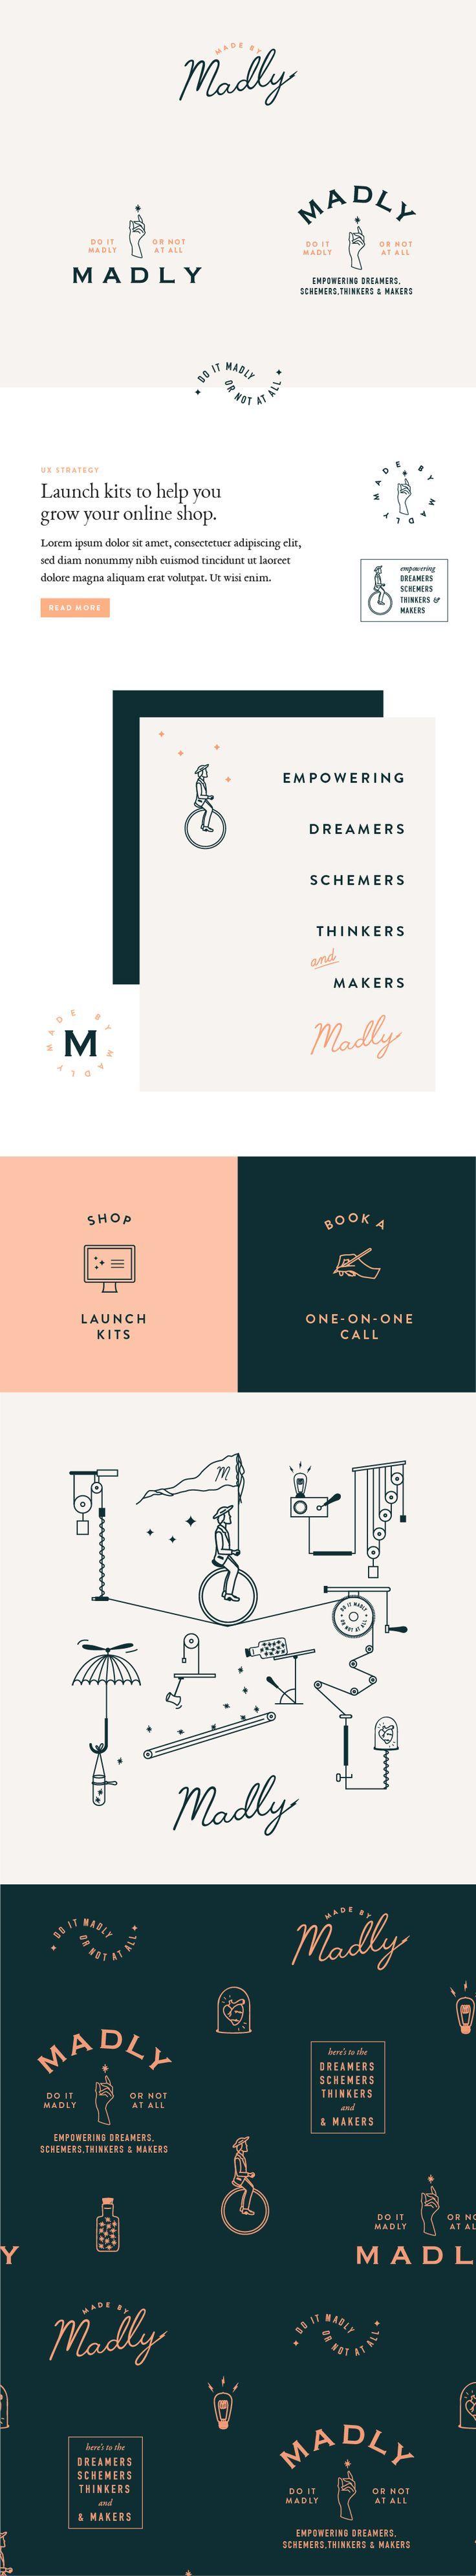 Madly Branding by Little Trailer Studio / graphic design inspiration / logo design